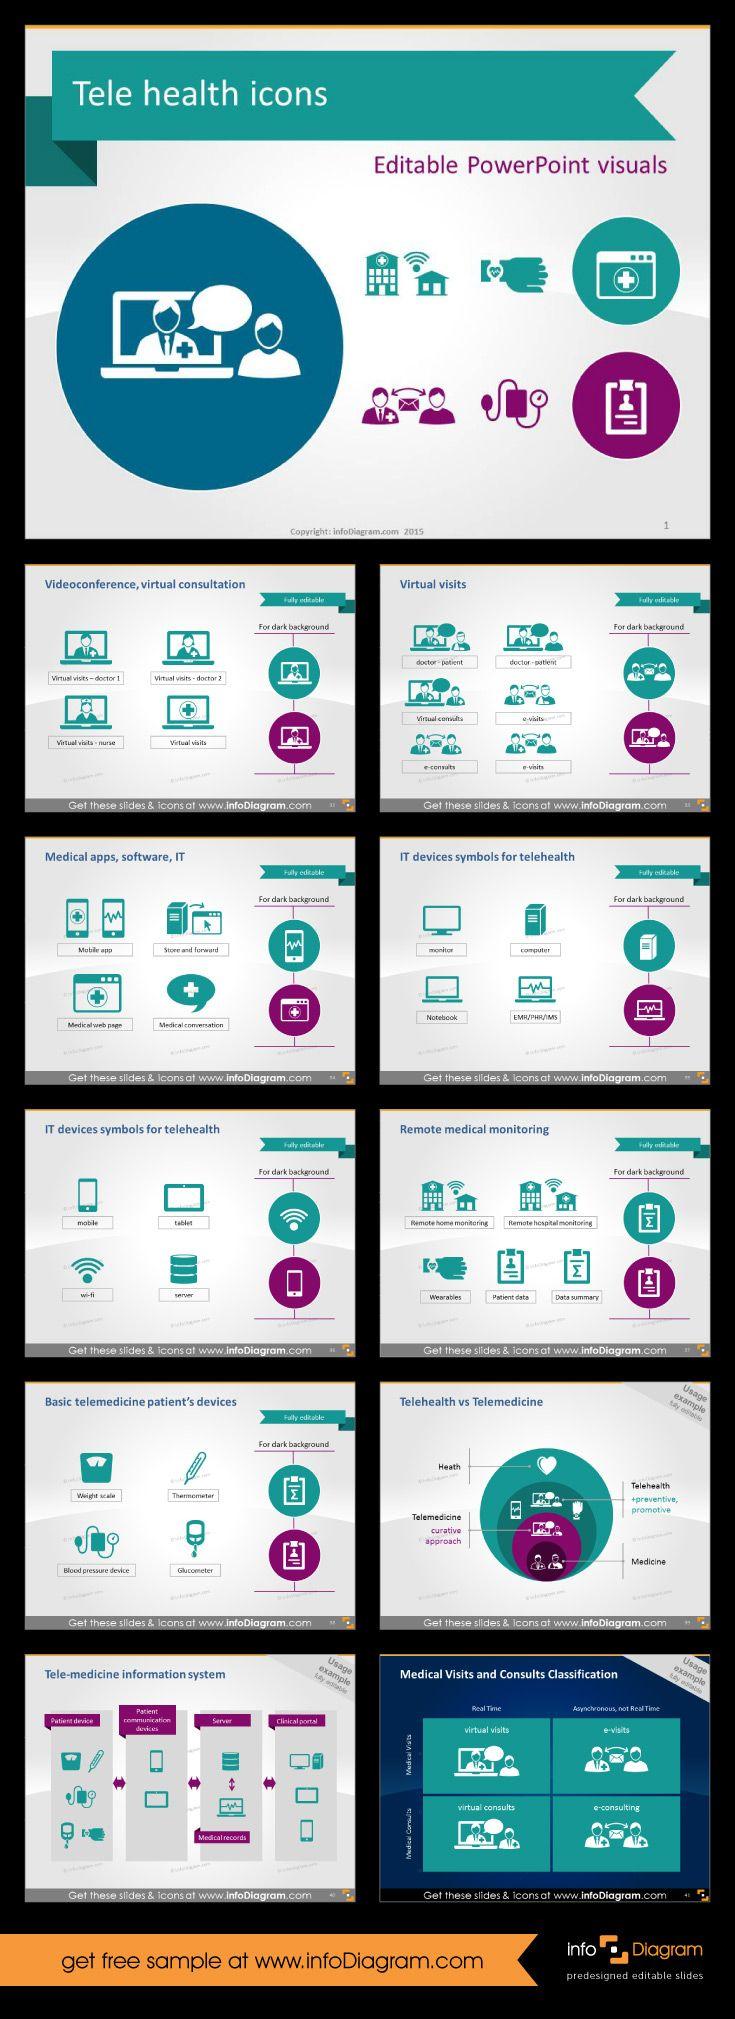 82833639e7bc75fc1eff865aa6d5c3d8--app-design-health-care Telehealth Care Newsletter Templates Free on